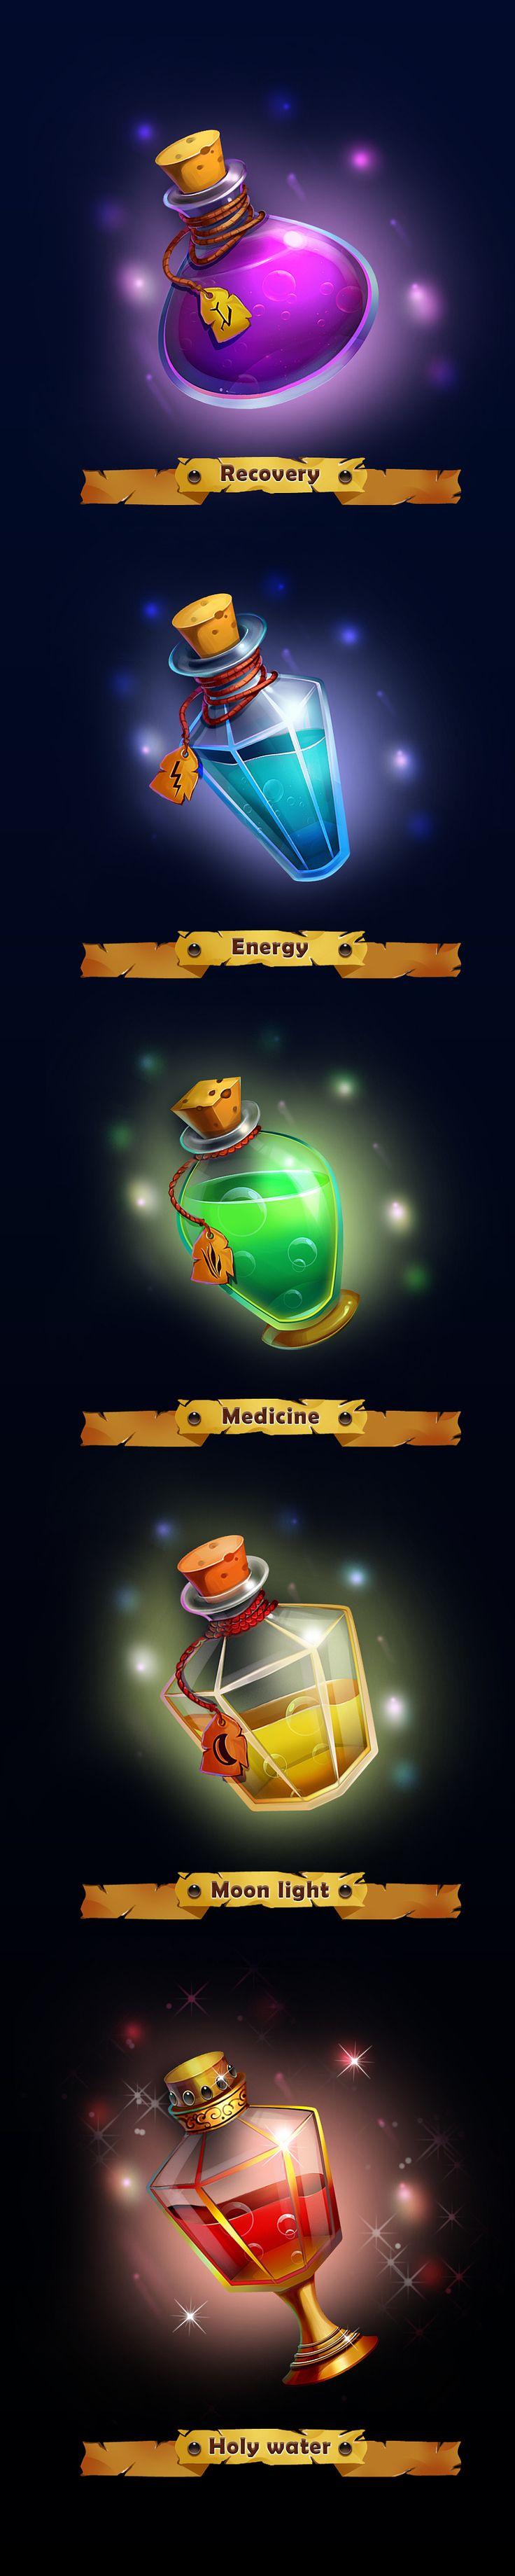 Different vials